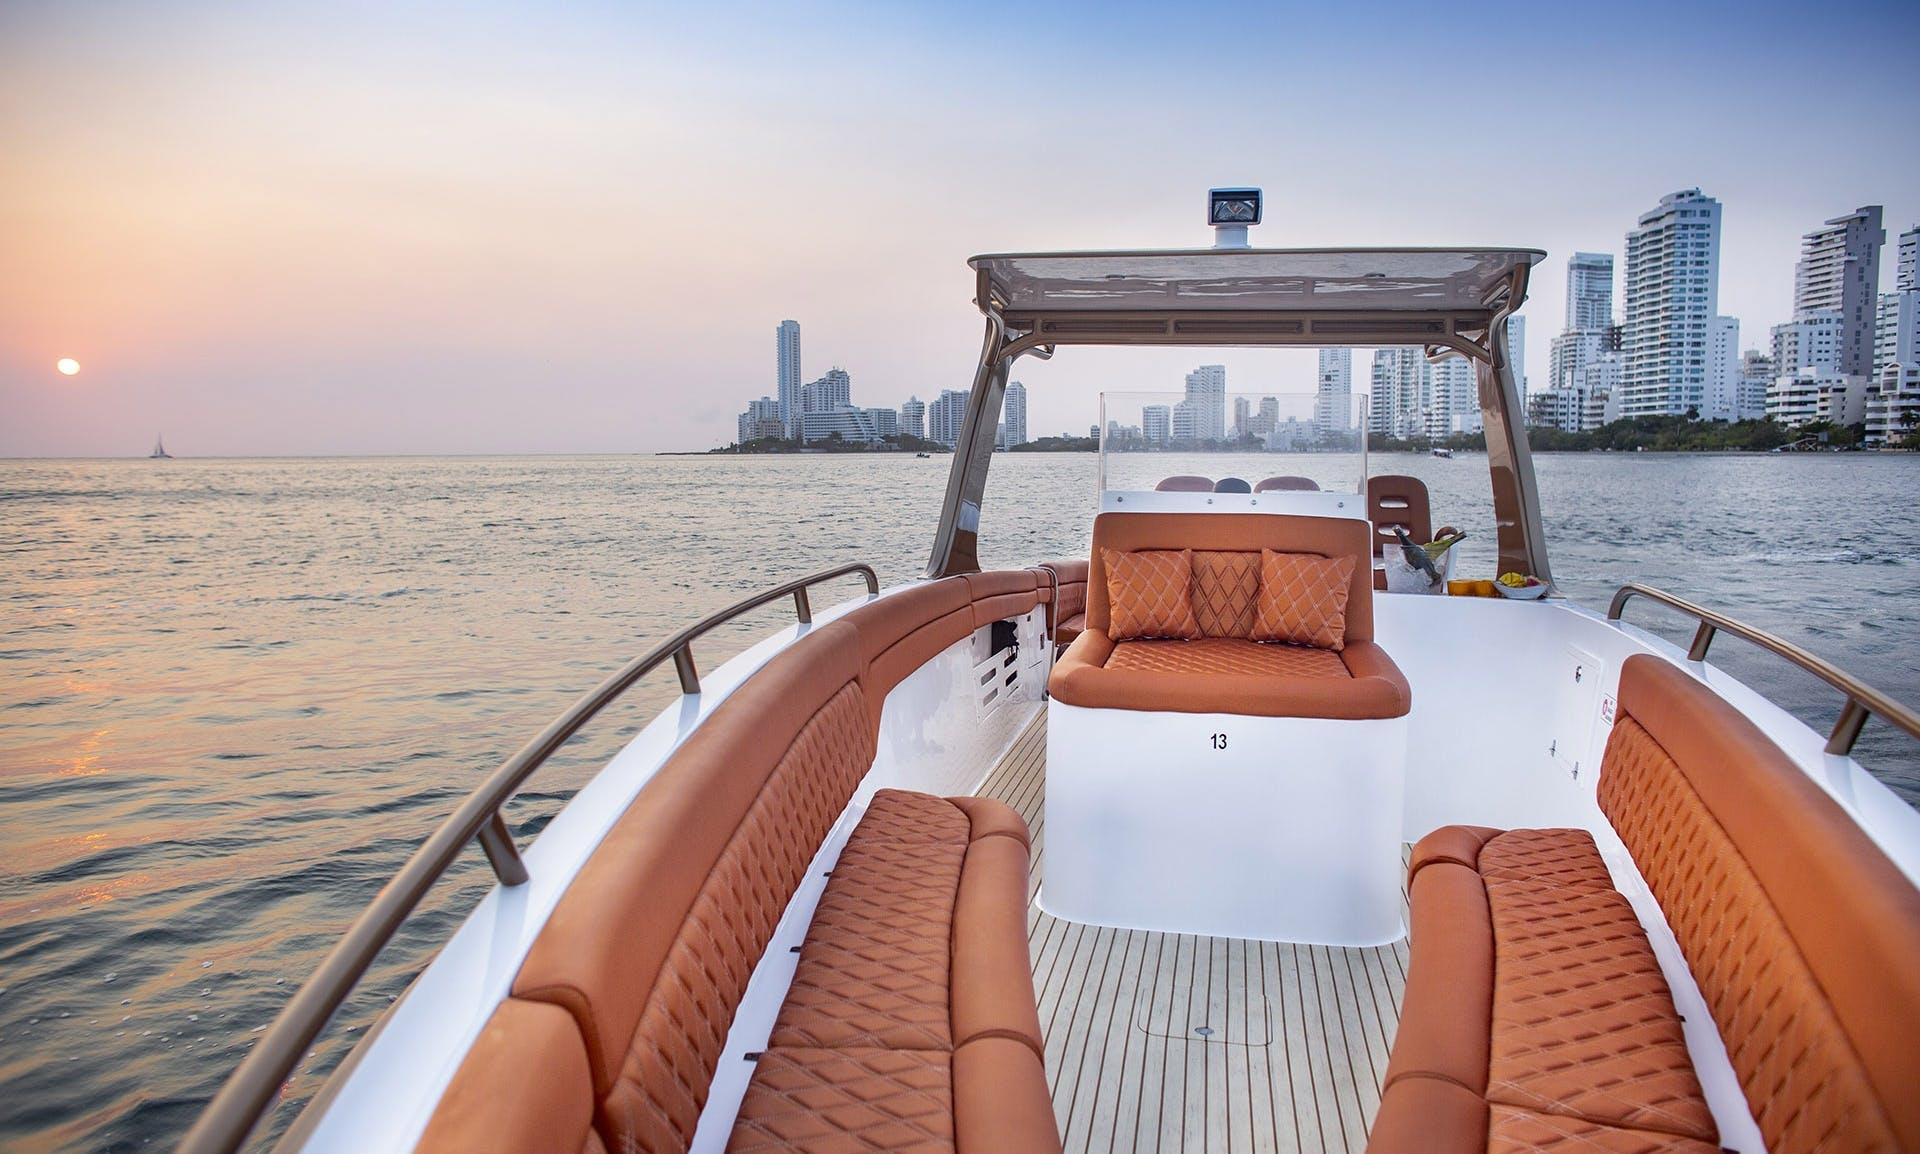 Exclusive Island Experience in Cartagena onboard a 42' Speedboat